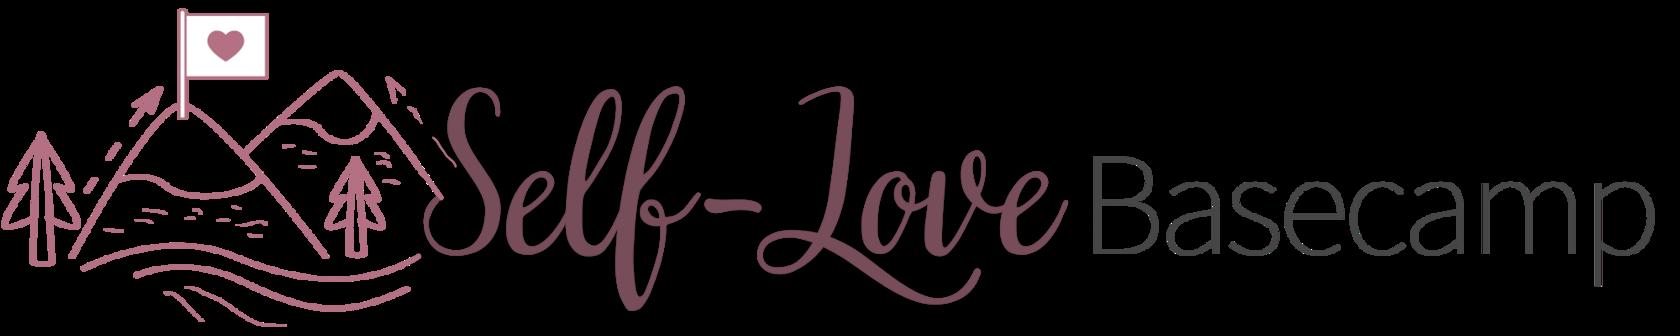 SelfLove Basecamp Logo